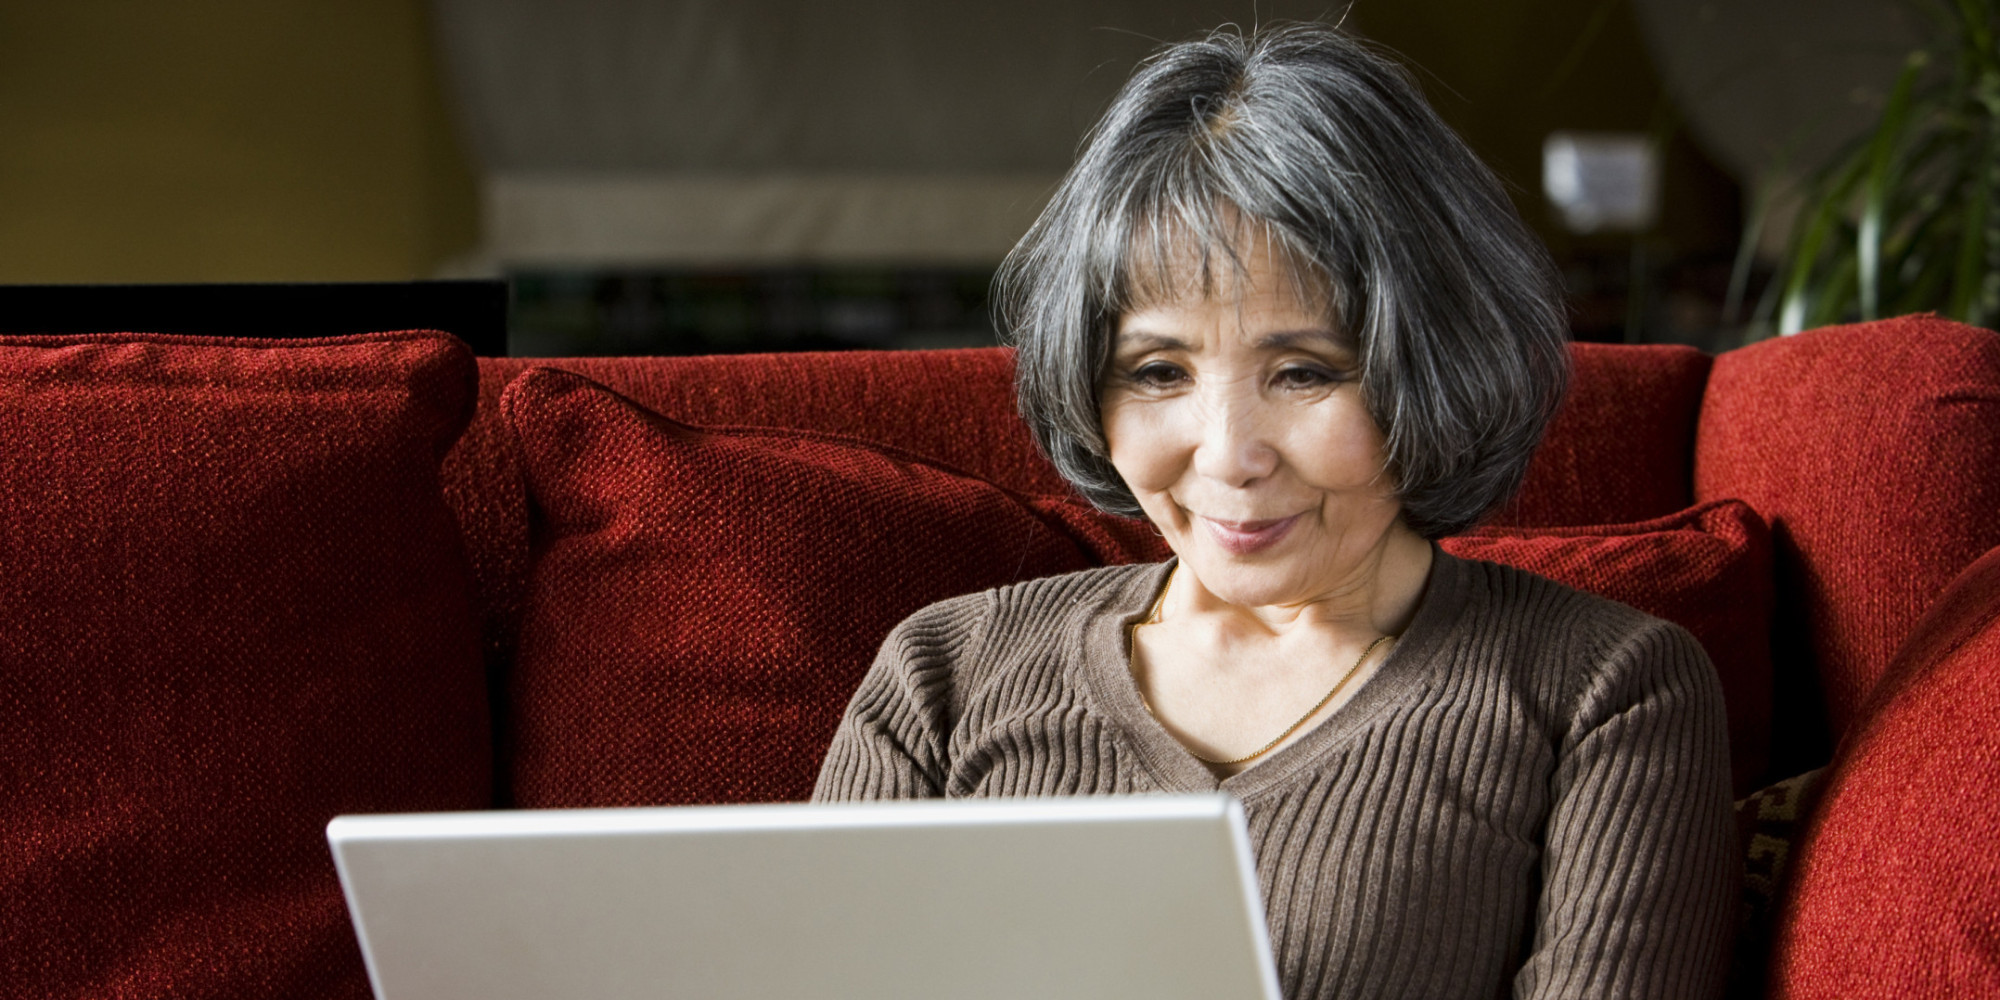 Online senior dating sites in hertigate